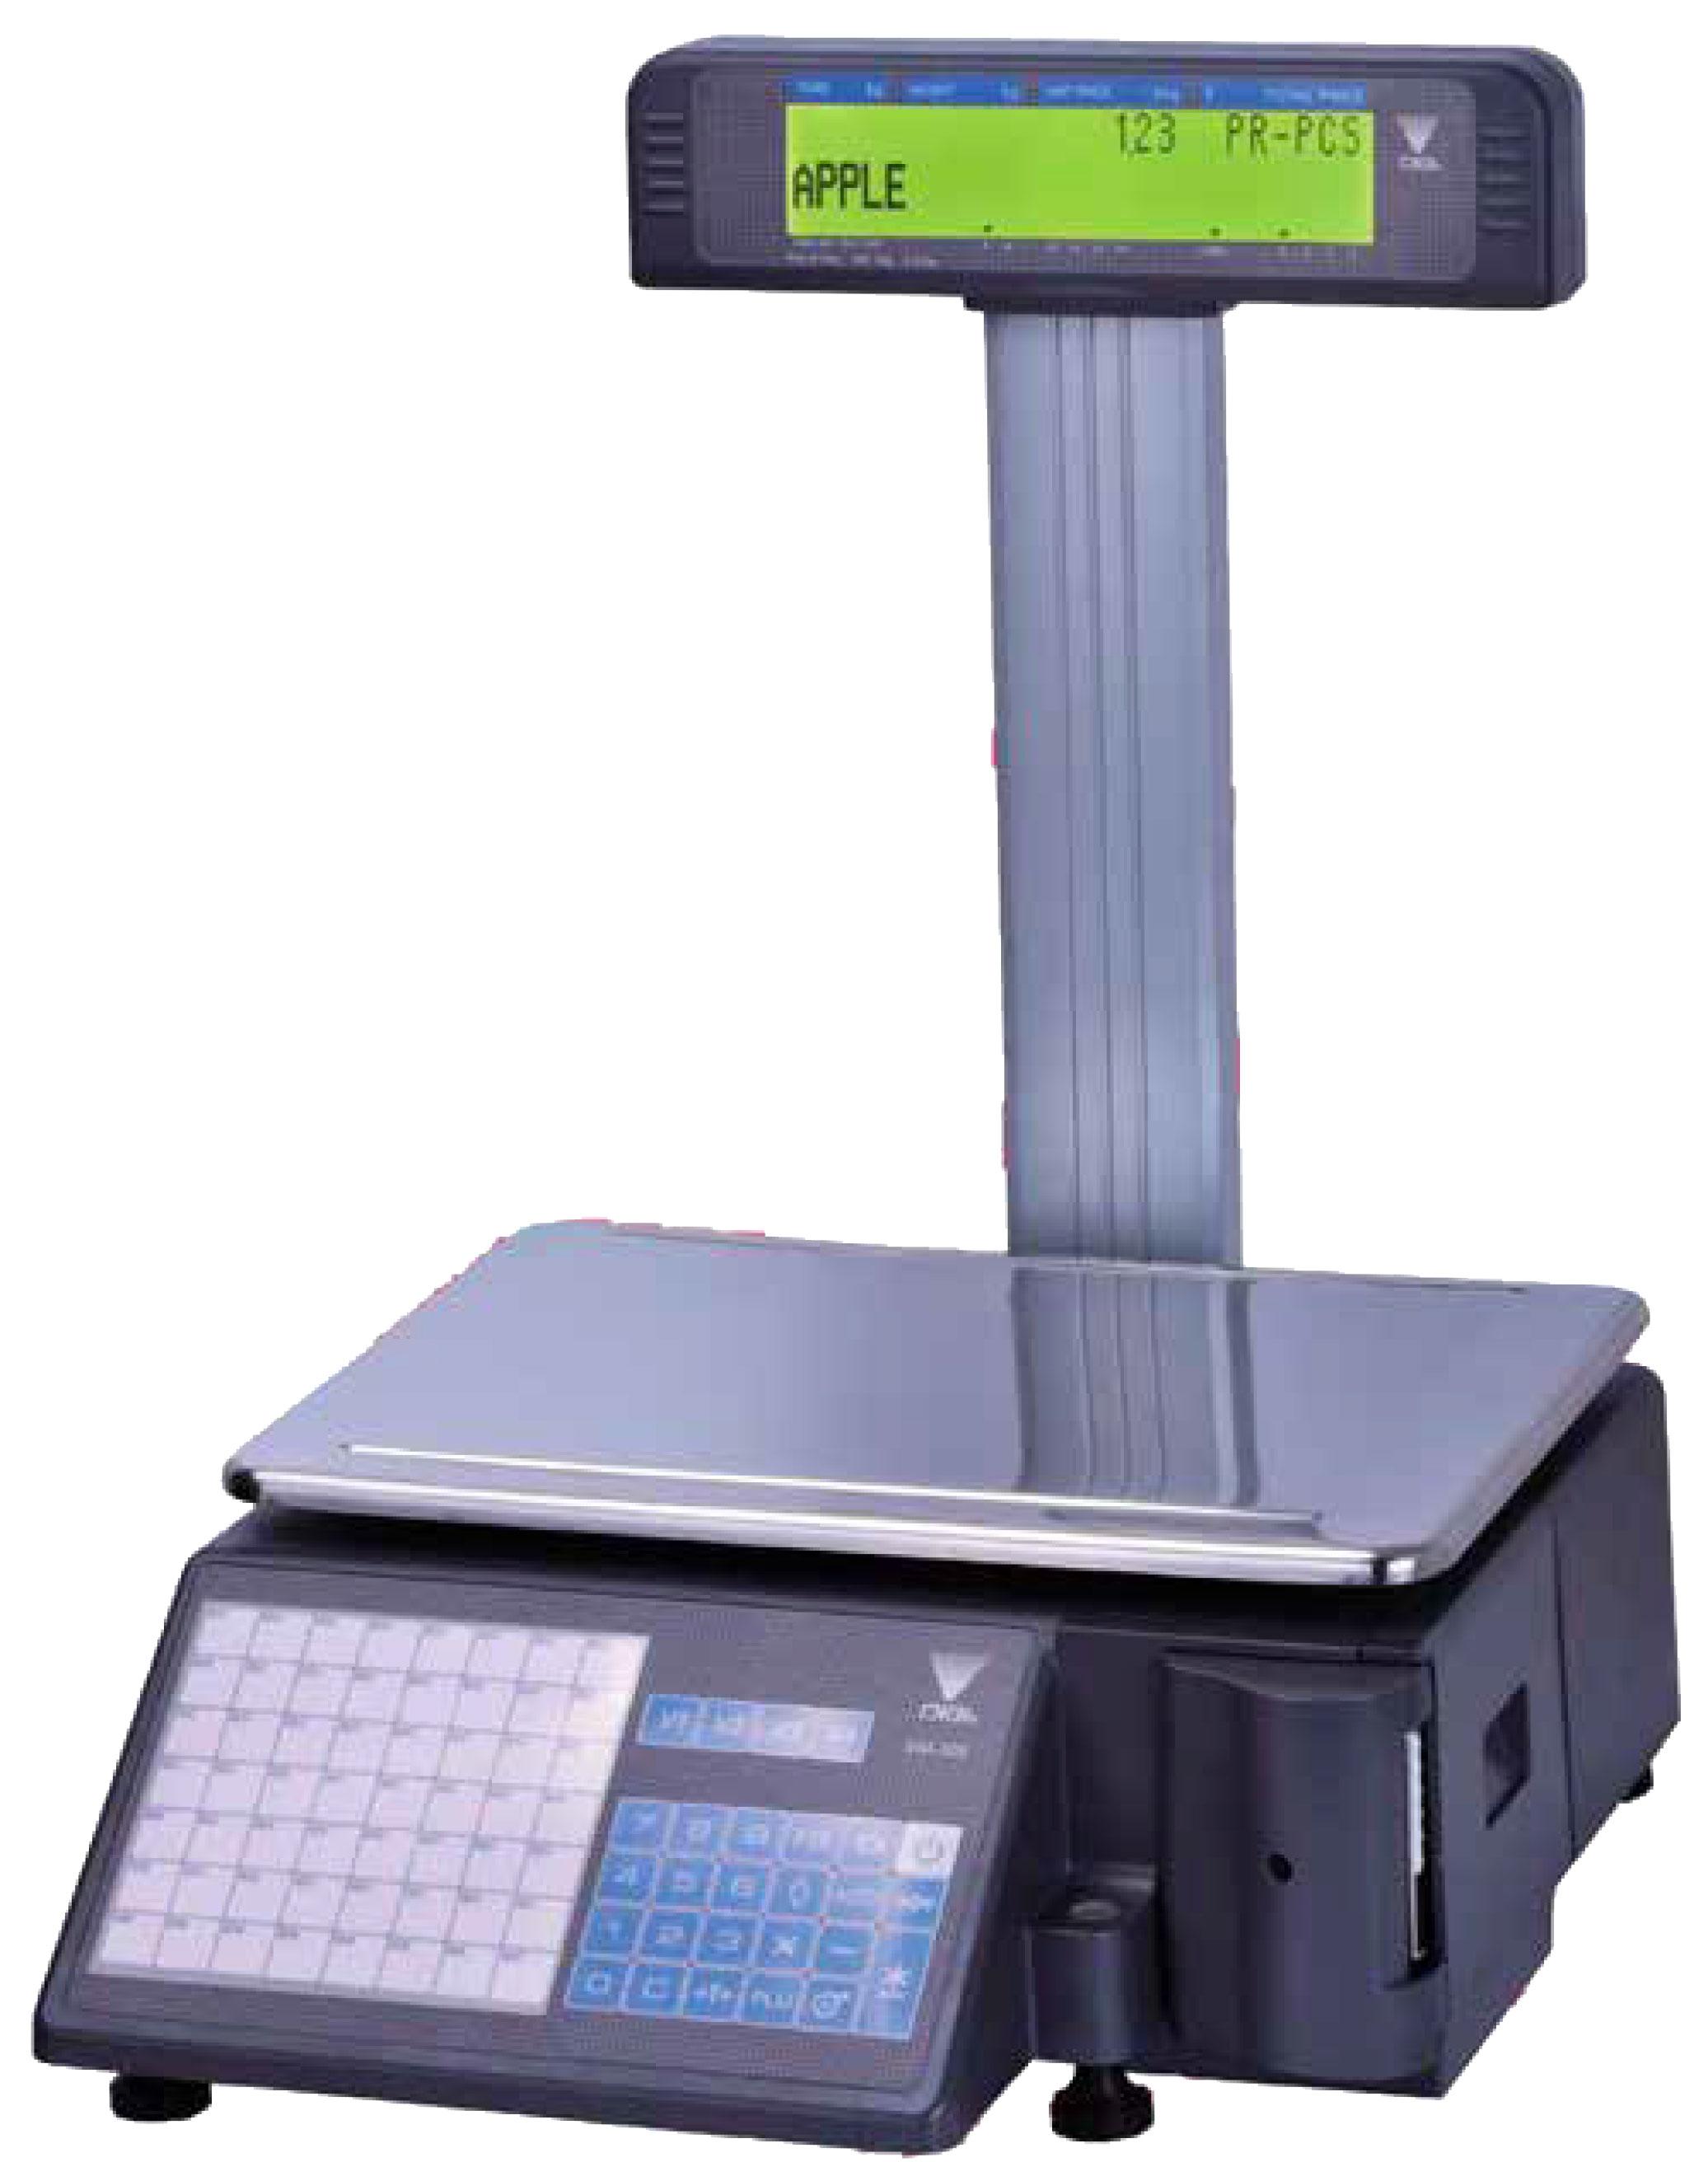 DIGITAL PRINTING SCALE 15KG/5G WITH DUAL POLE DISPLAY -SM320P